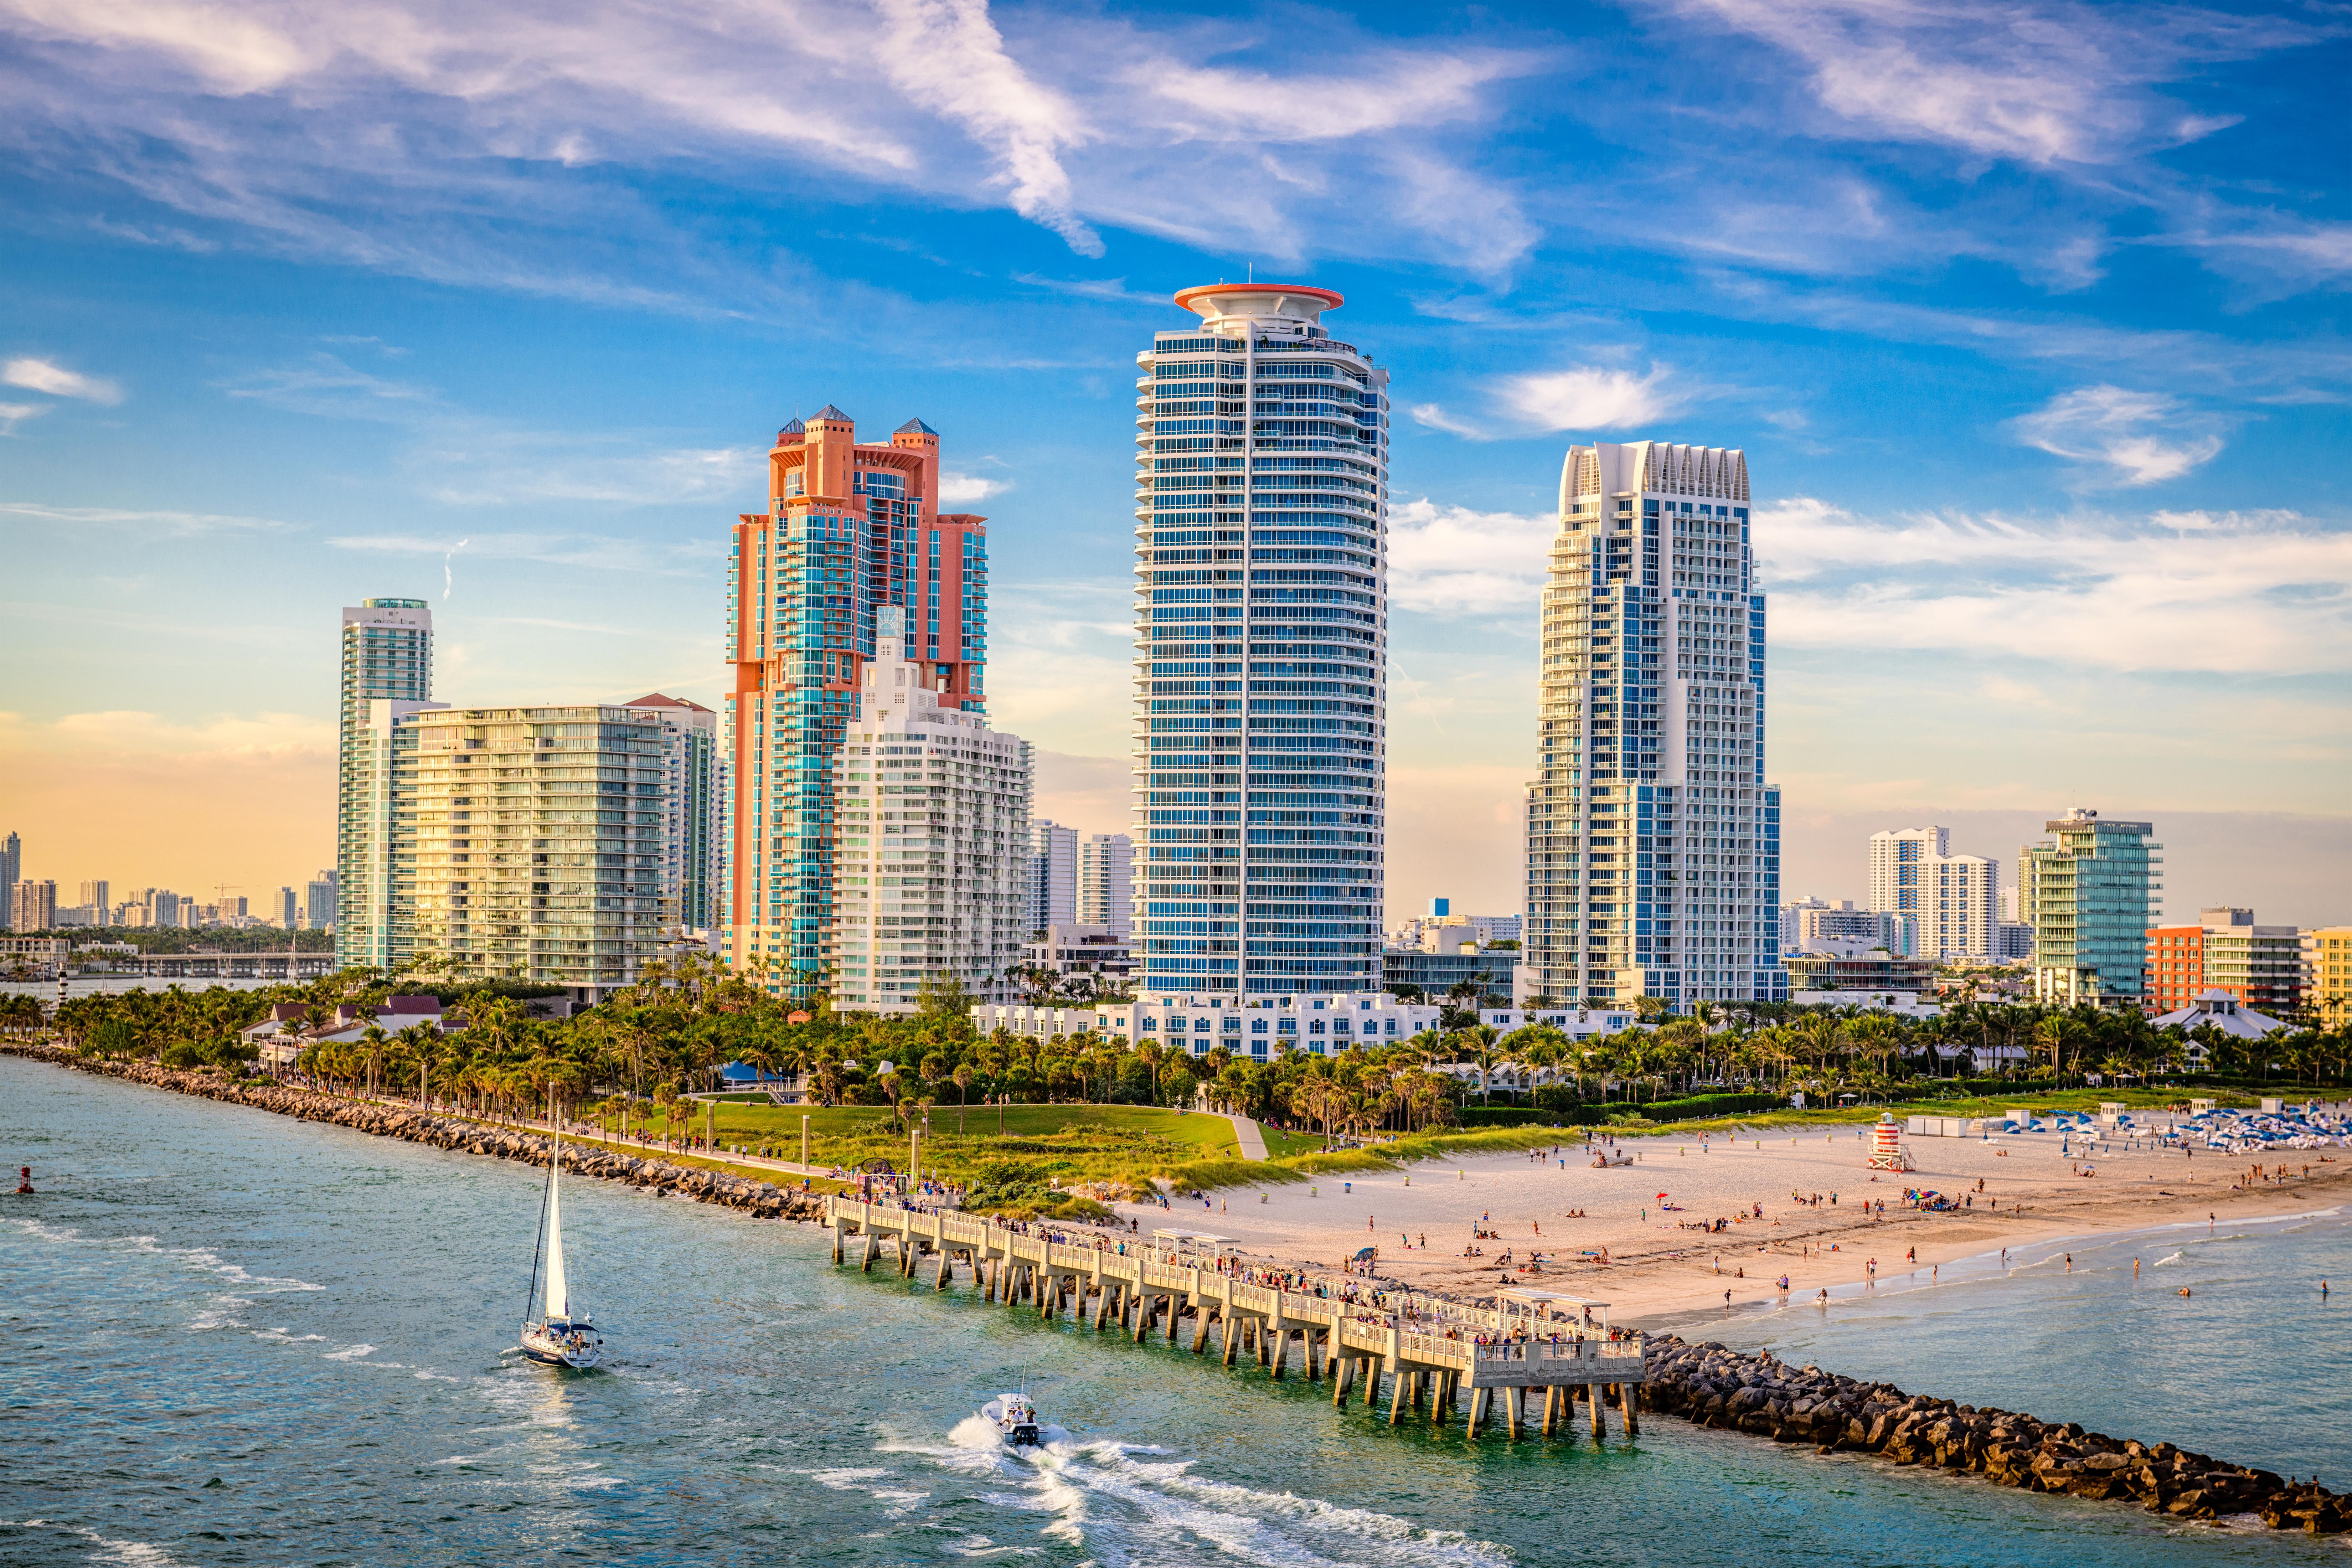 Condo building on South Beach in Miami, Florida near South Pointe Park.